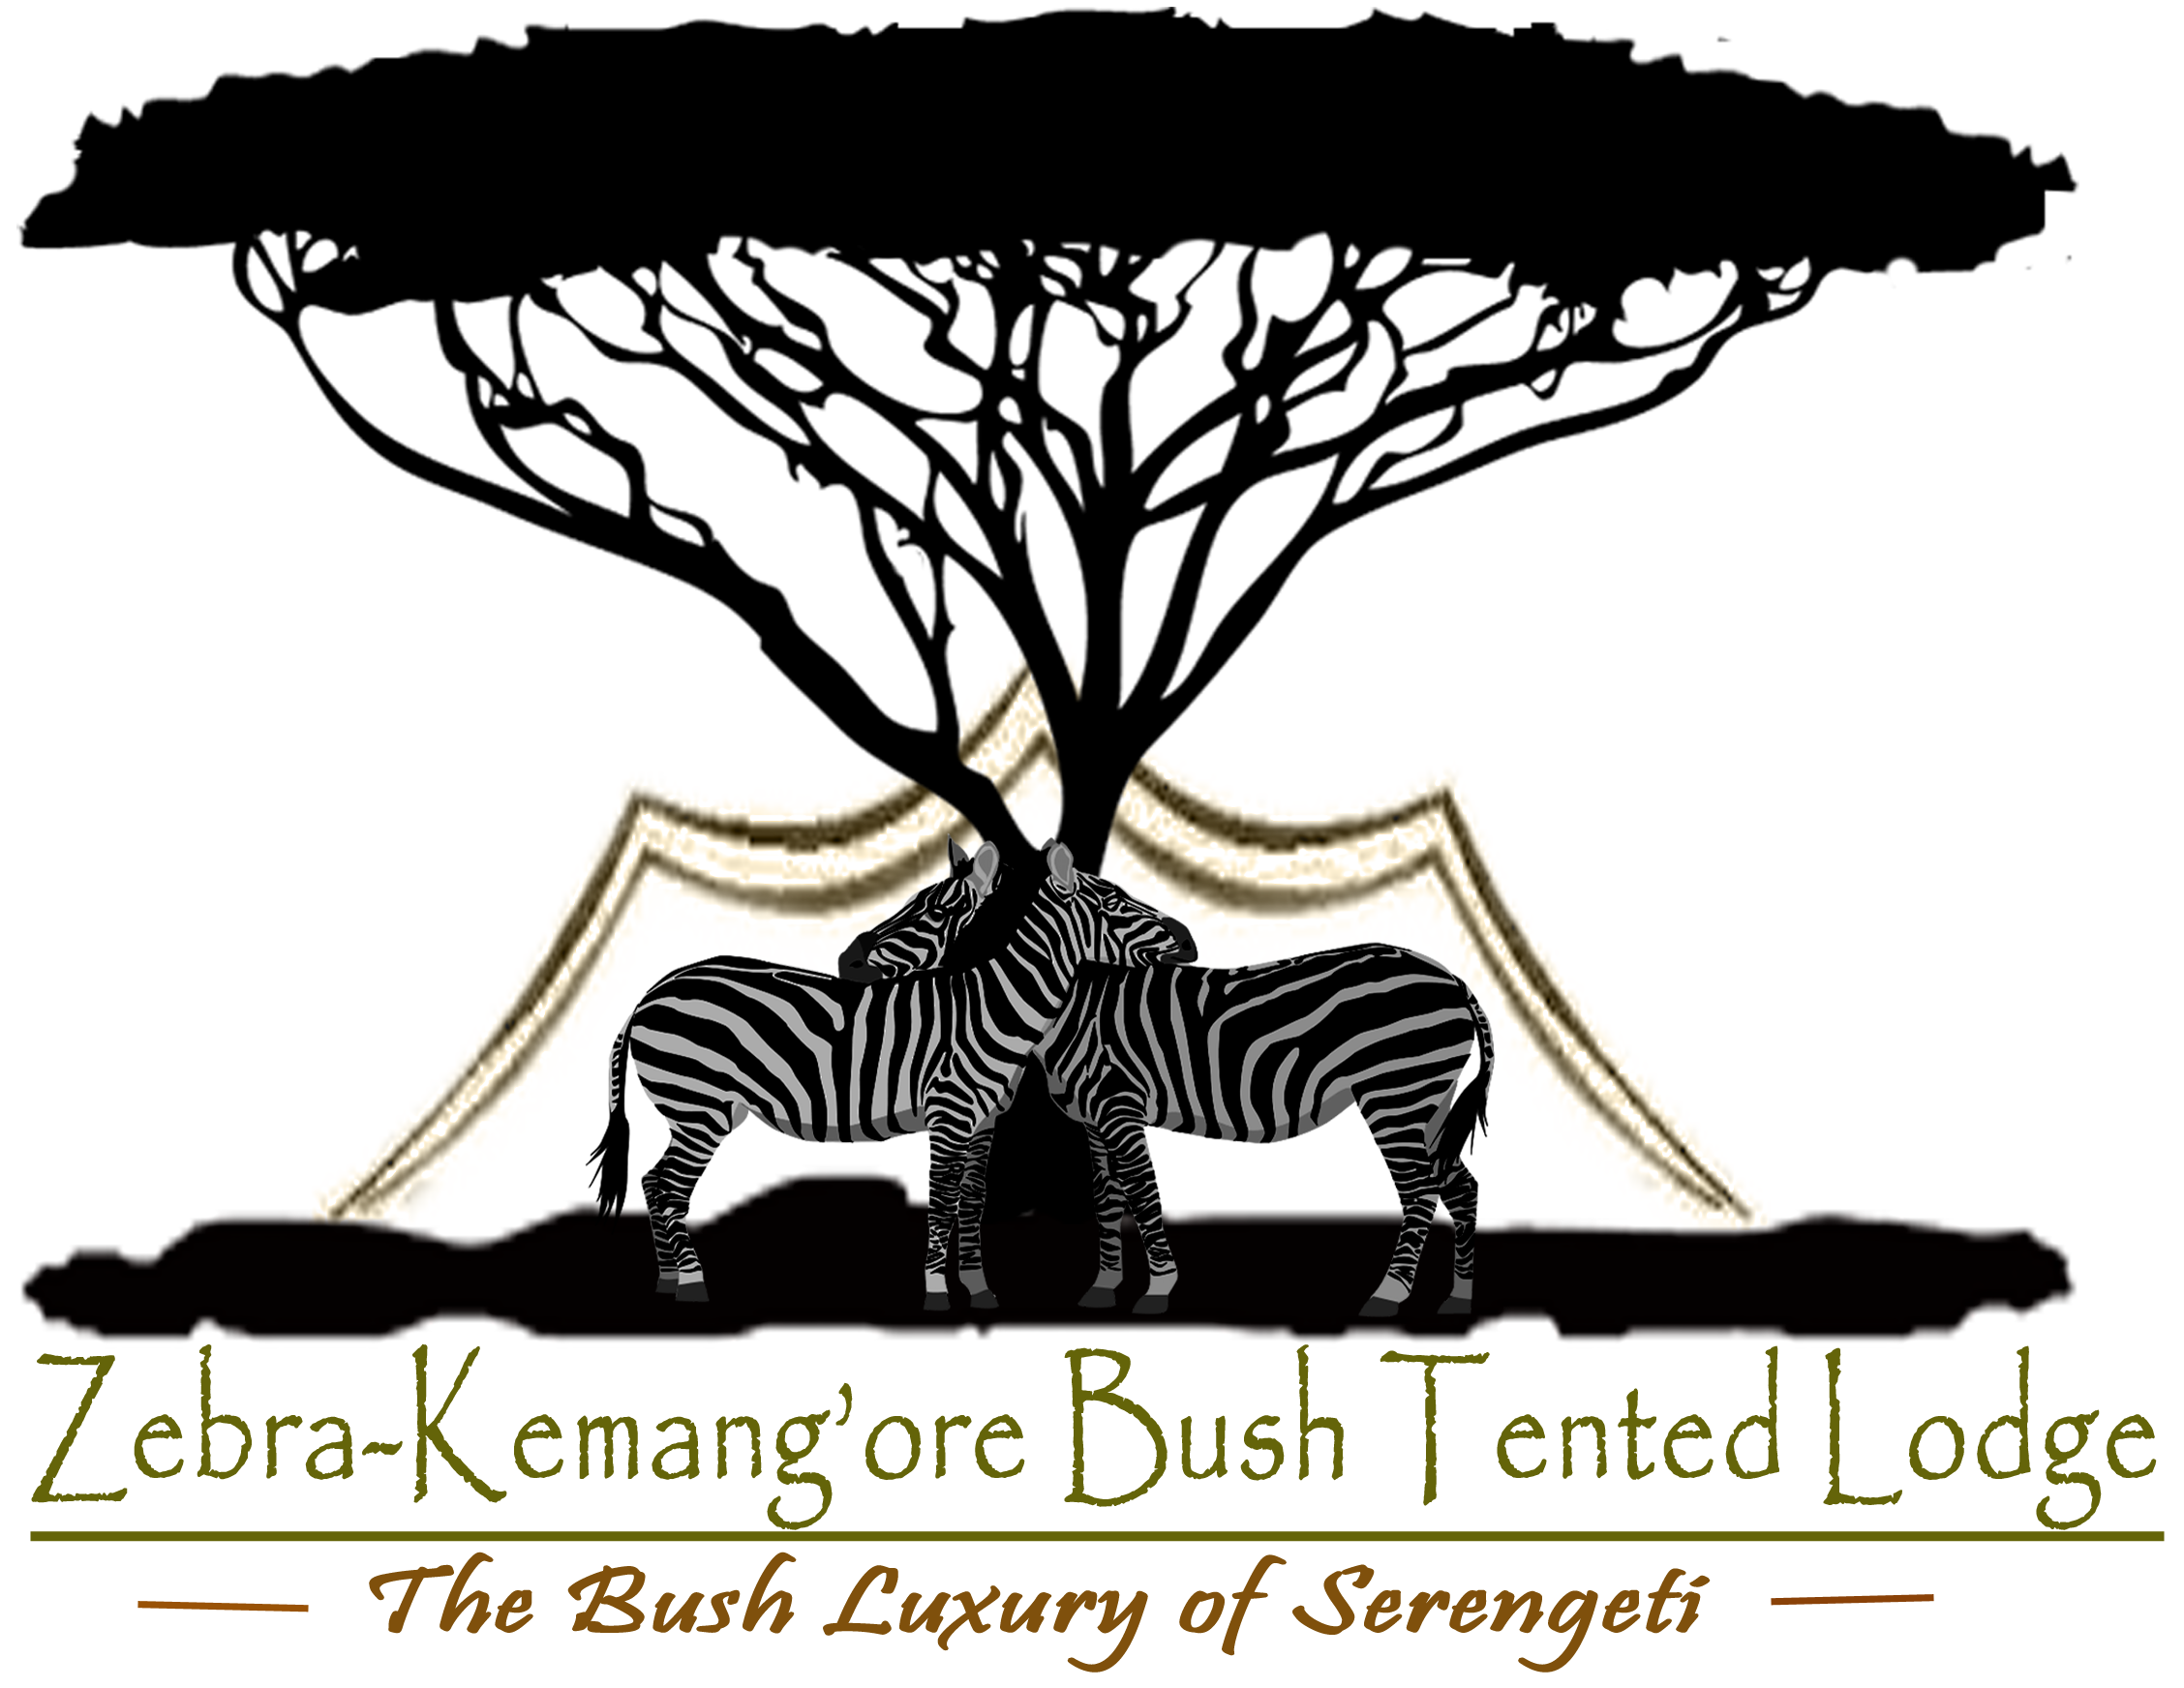 Bush tented lodge. Clipart zebra zebra herd